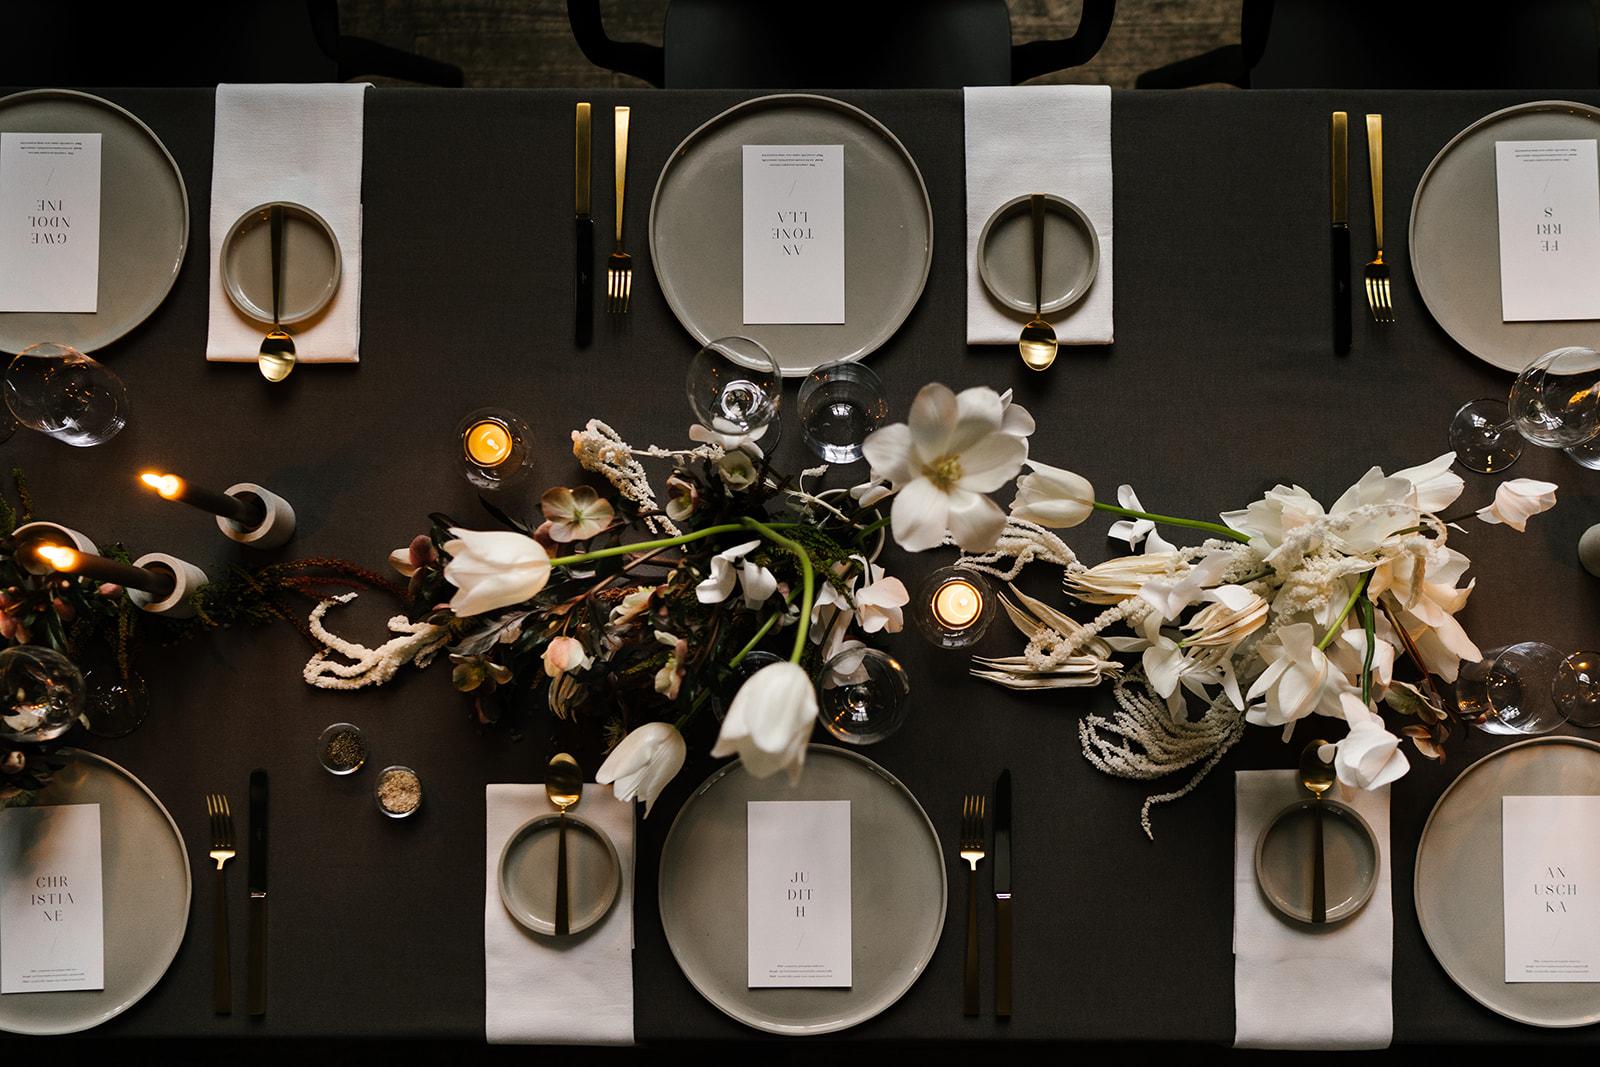 Hilde-Stories-Jessica-Williams-Photography-Still-Life-Flowers-90.jpg